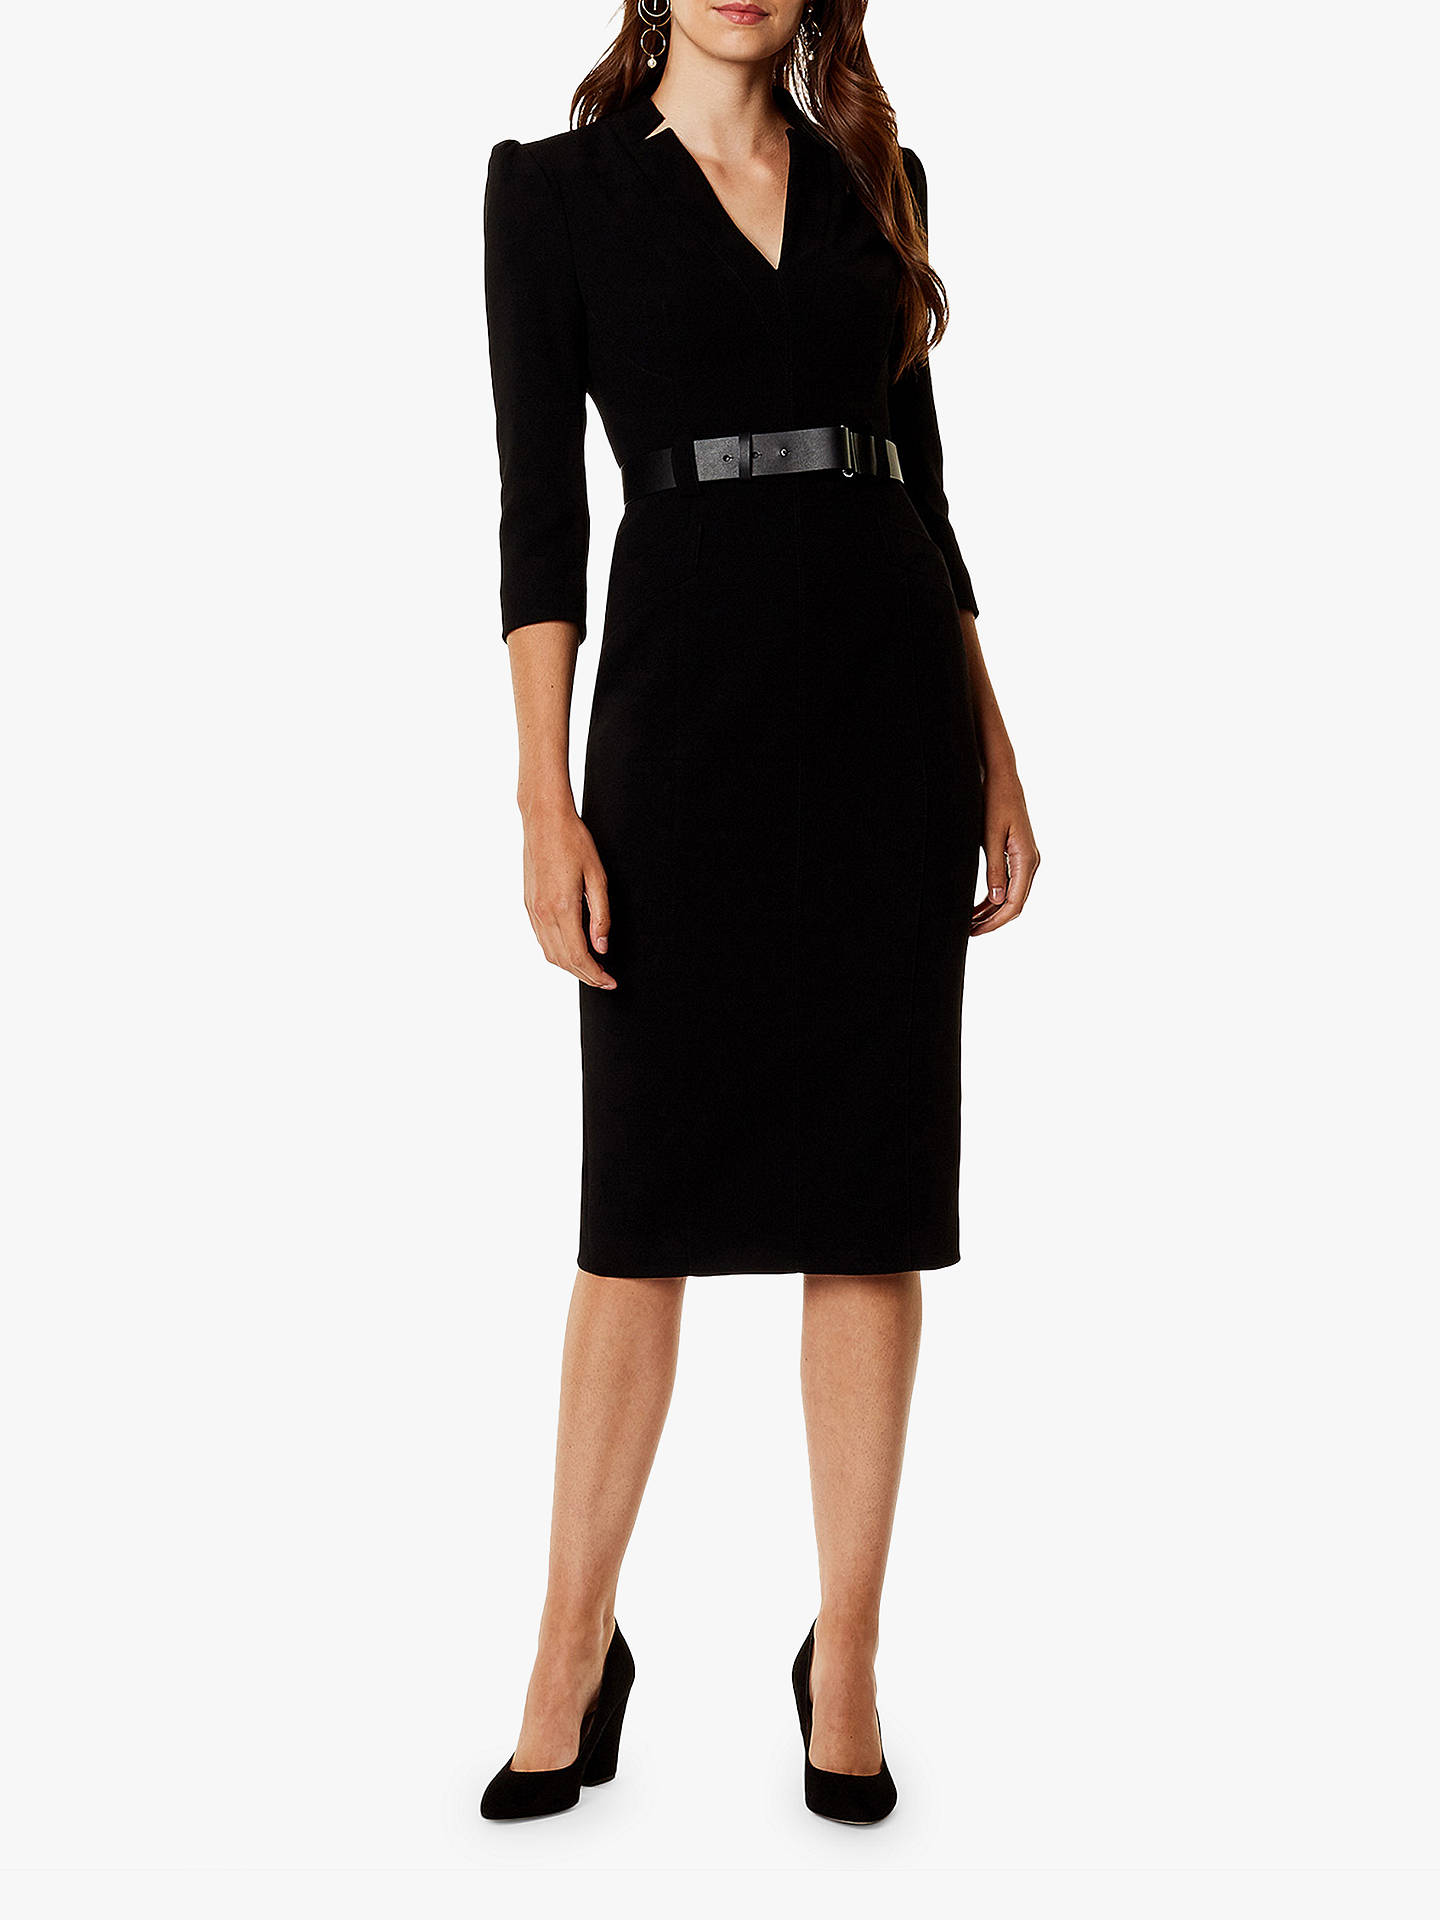 693ece76ae Buy Karen Millen Statement Shoulder Belted Midi Dress, Black, 6 Online at  johnlewis.